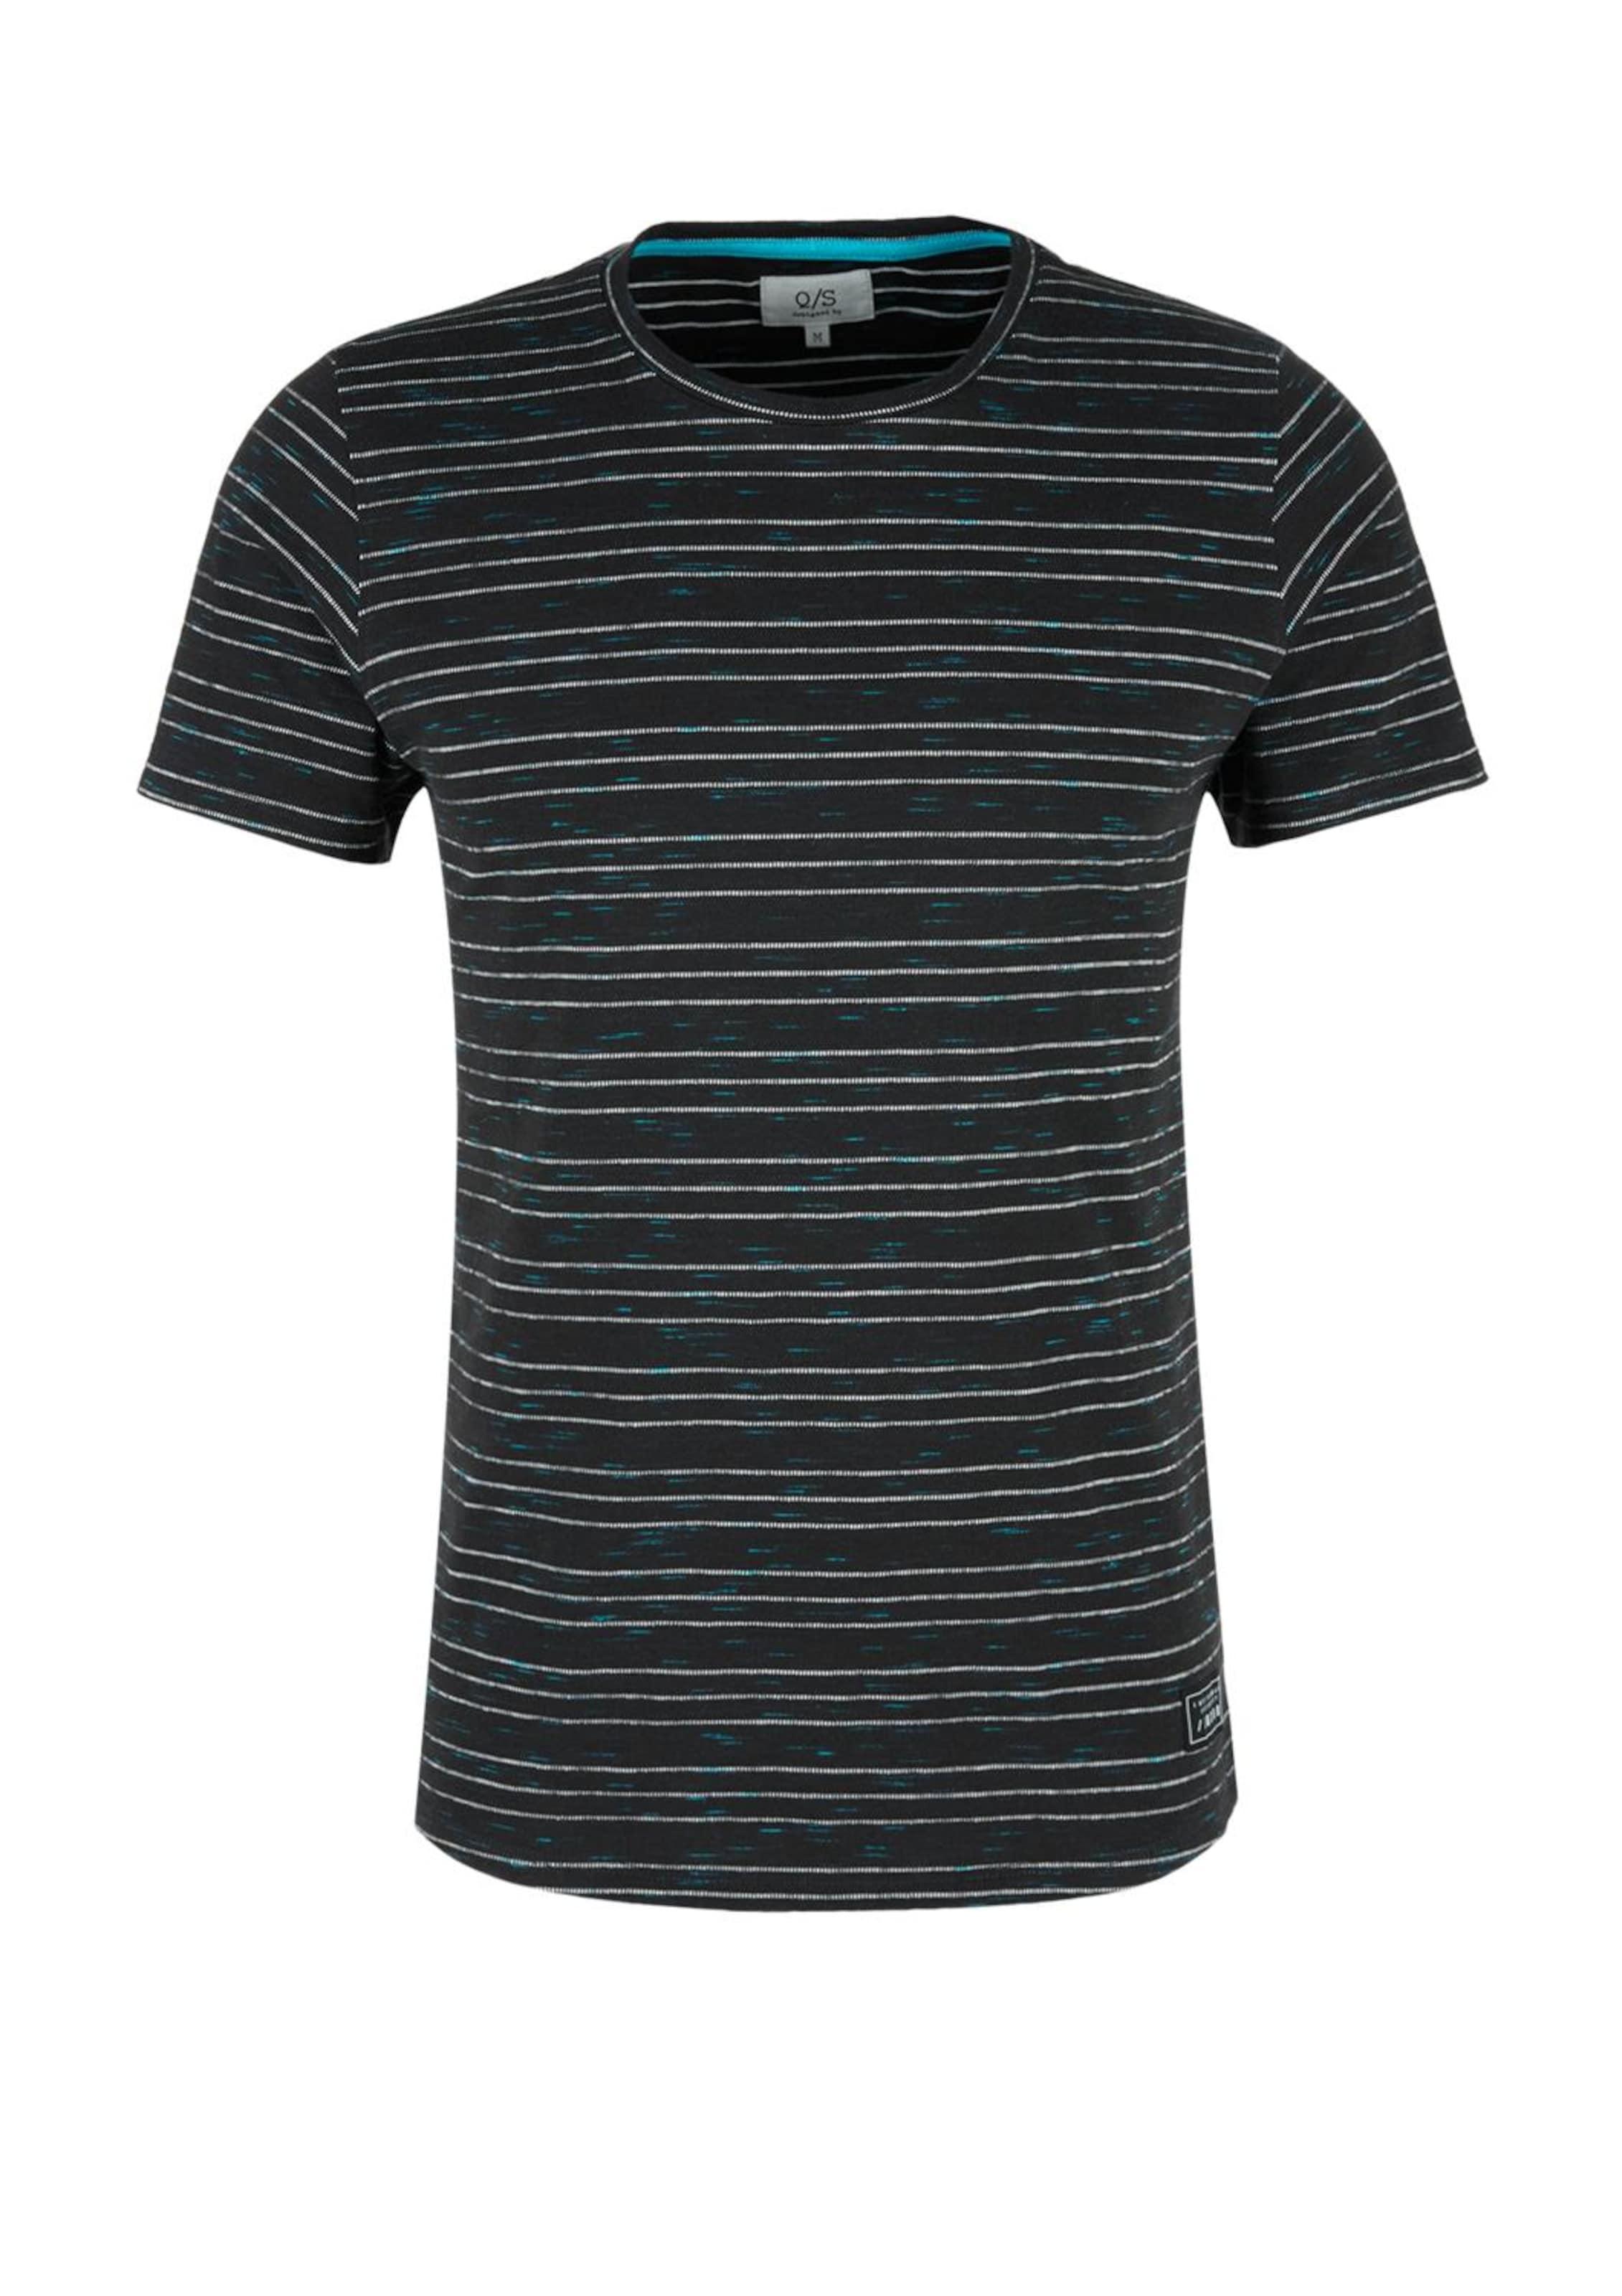 Designed T AquaSchwarz Weiß Q shirt In By s PkiuOZX